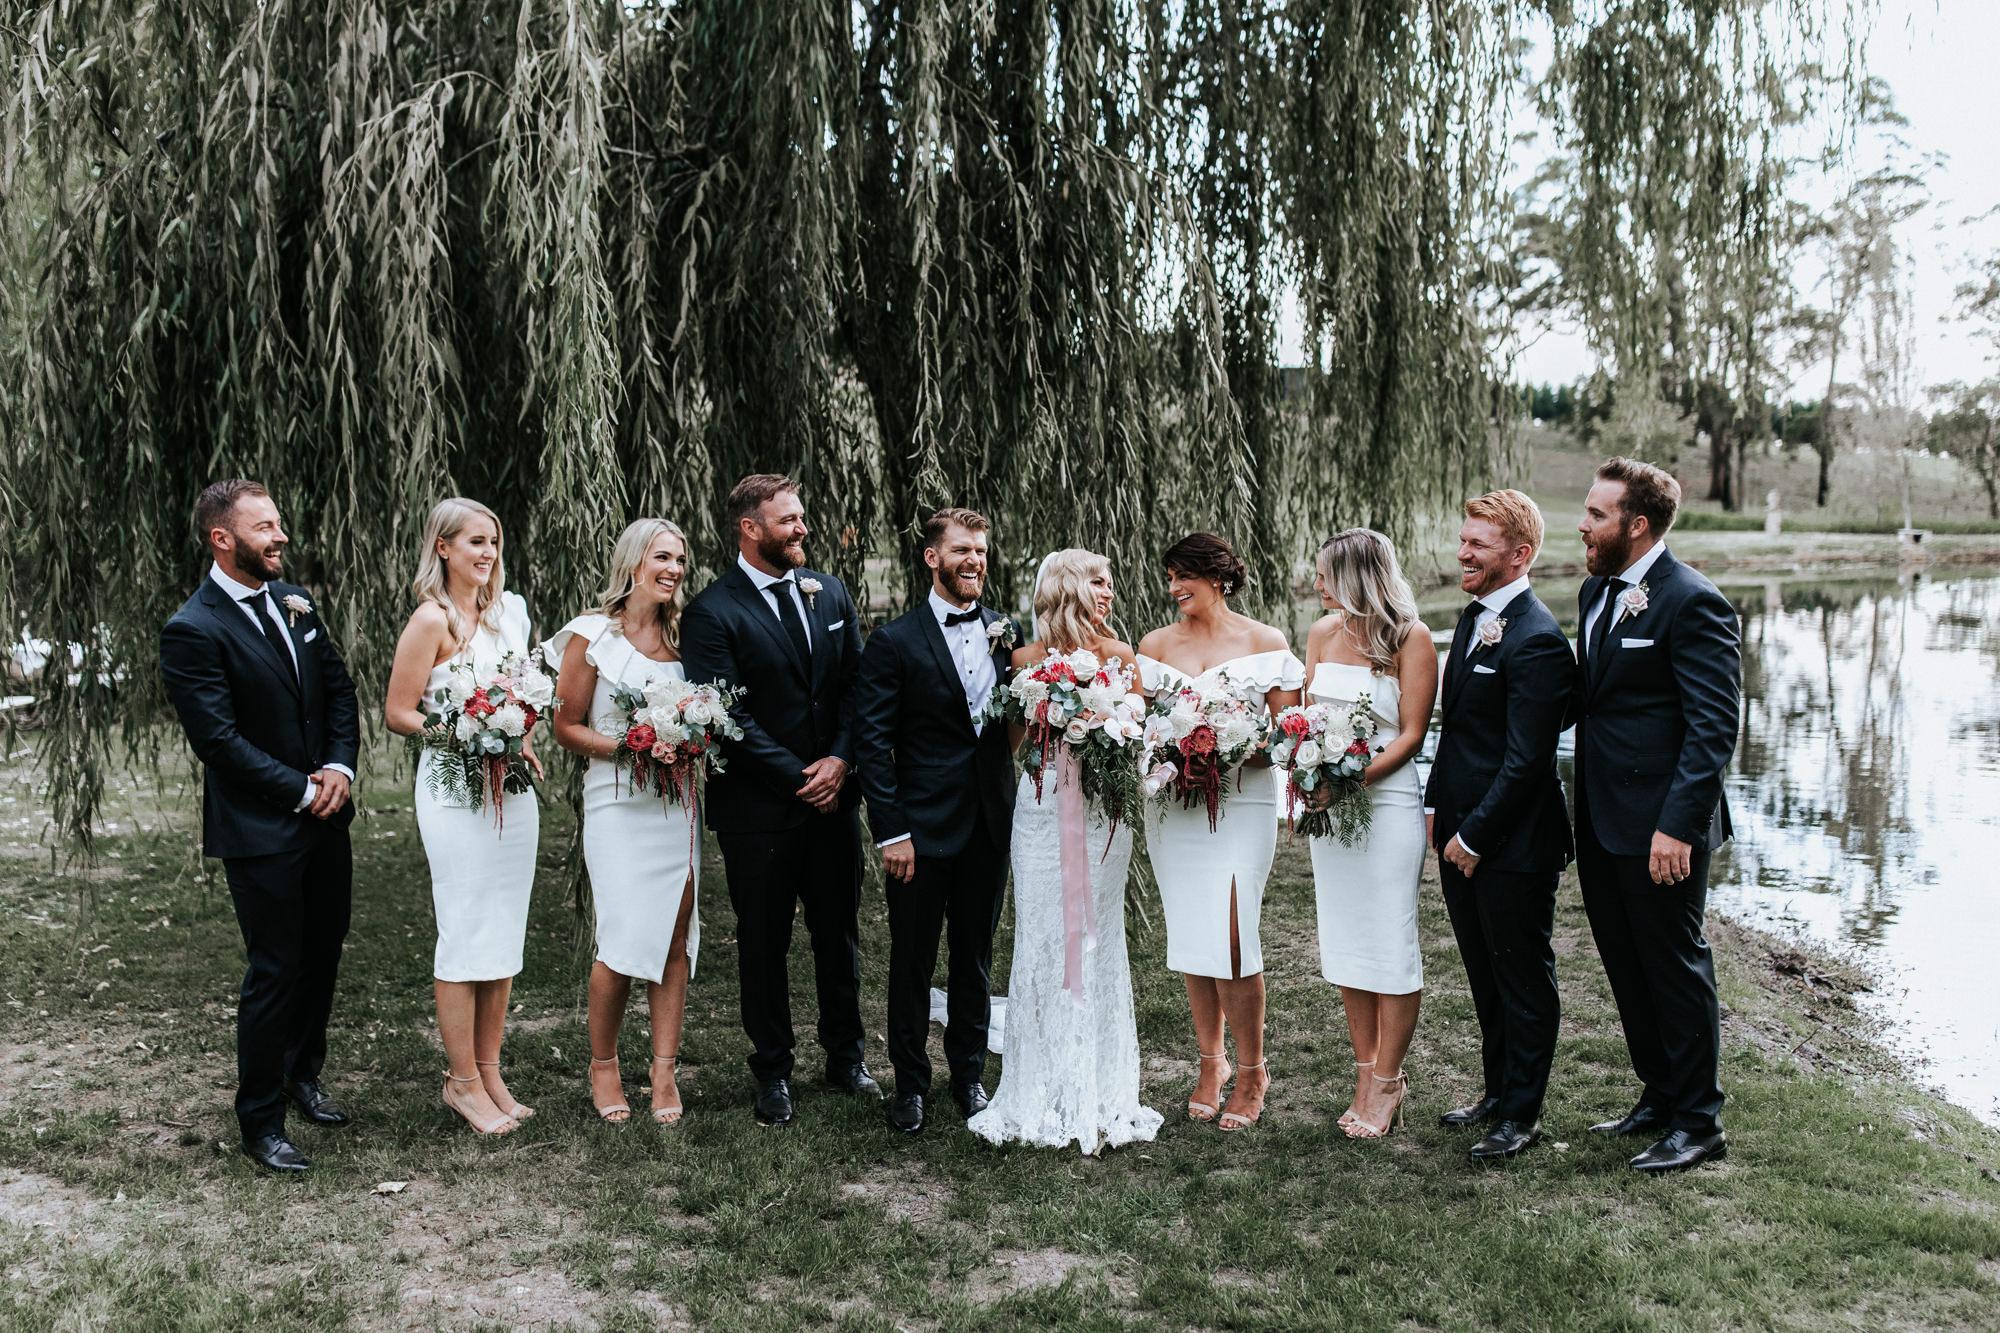 mali-brae-wedding-natalie-scott-baldwin-17.jpg